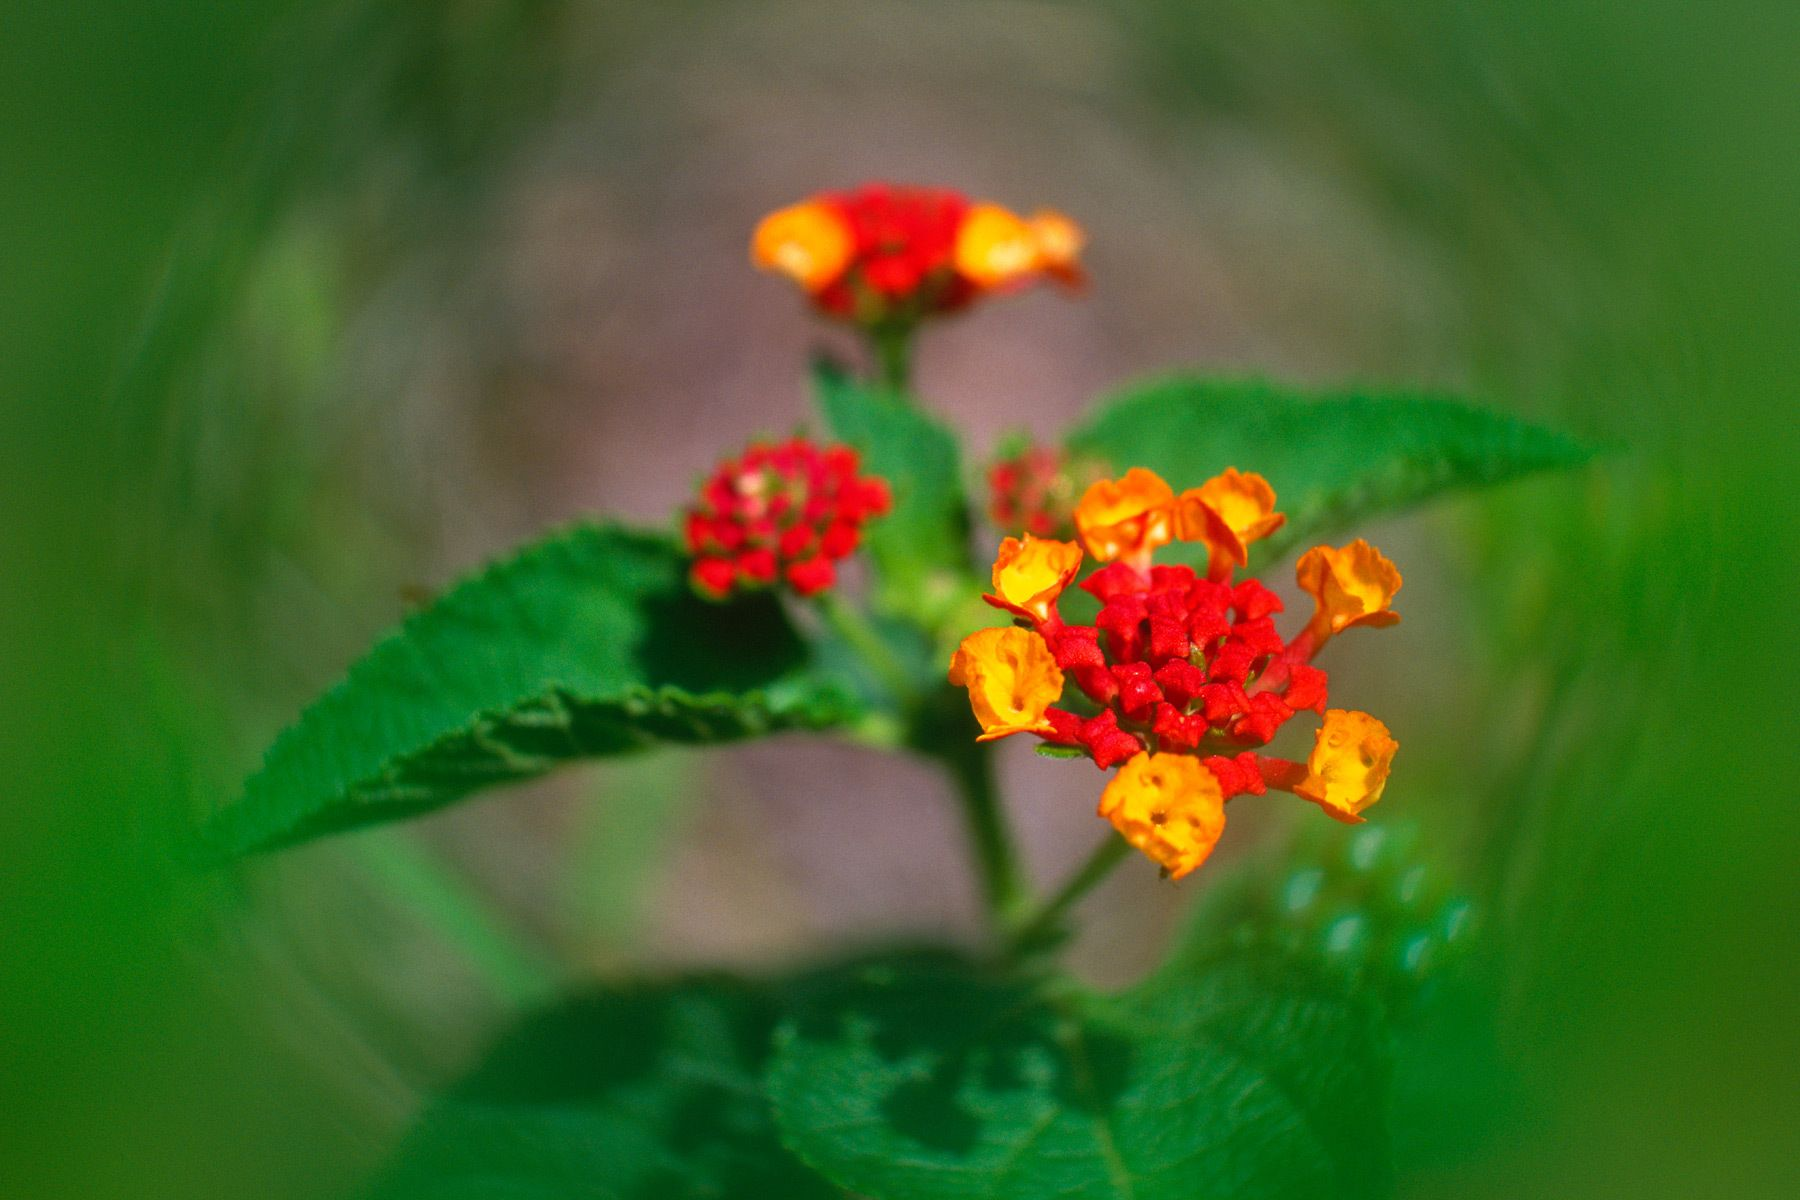 1blurred_flowers.jpg